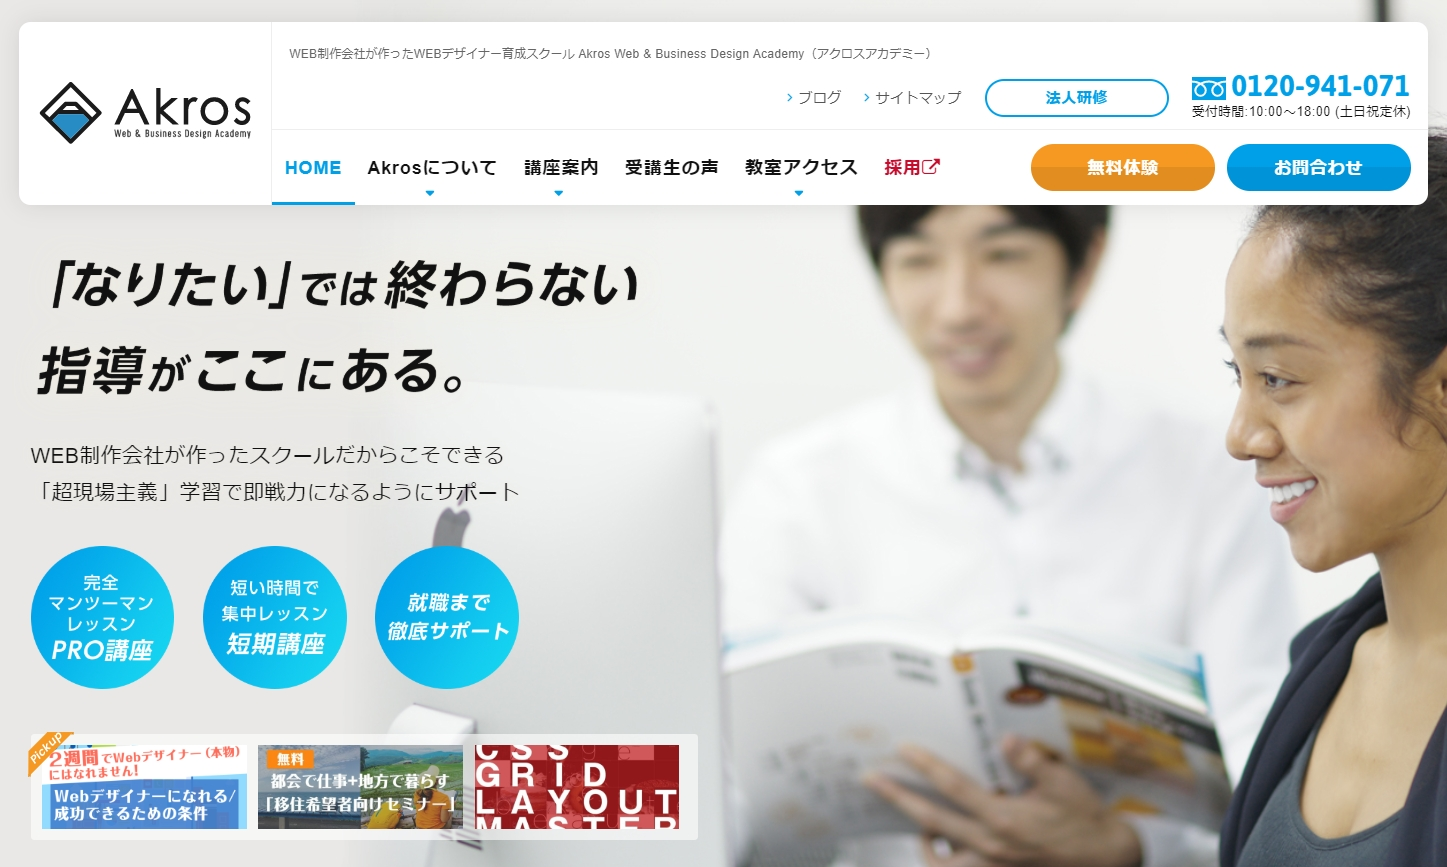 Akros(旧:Web塾)